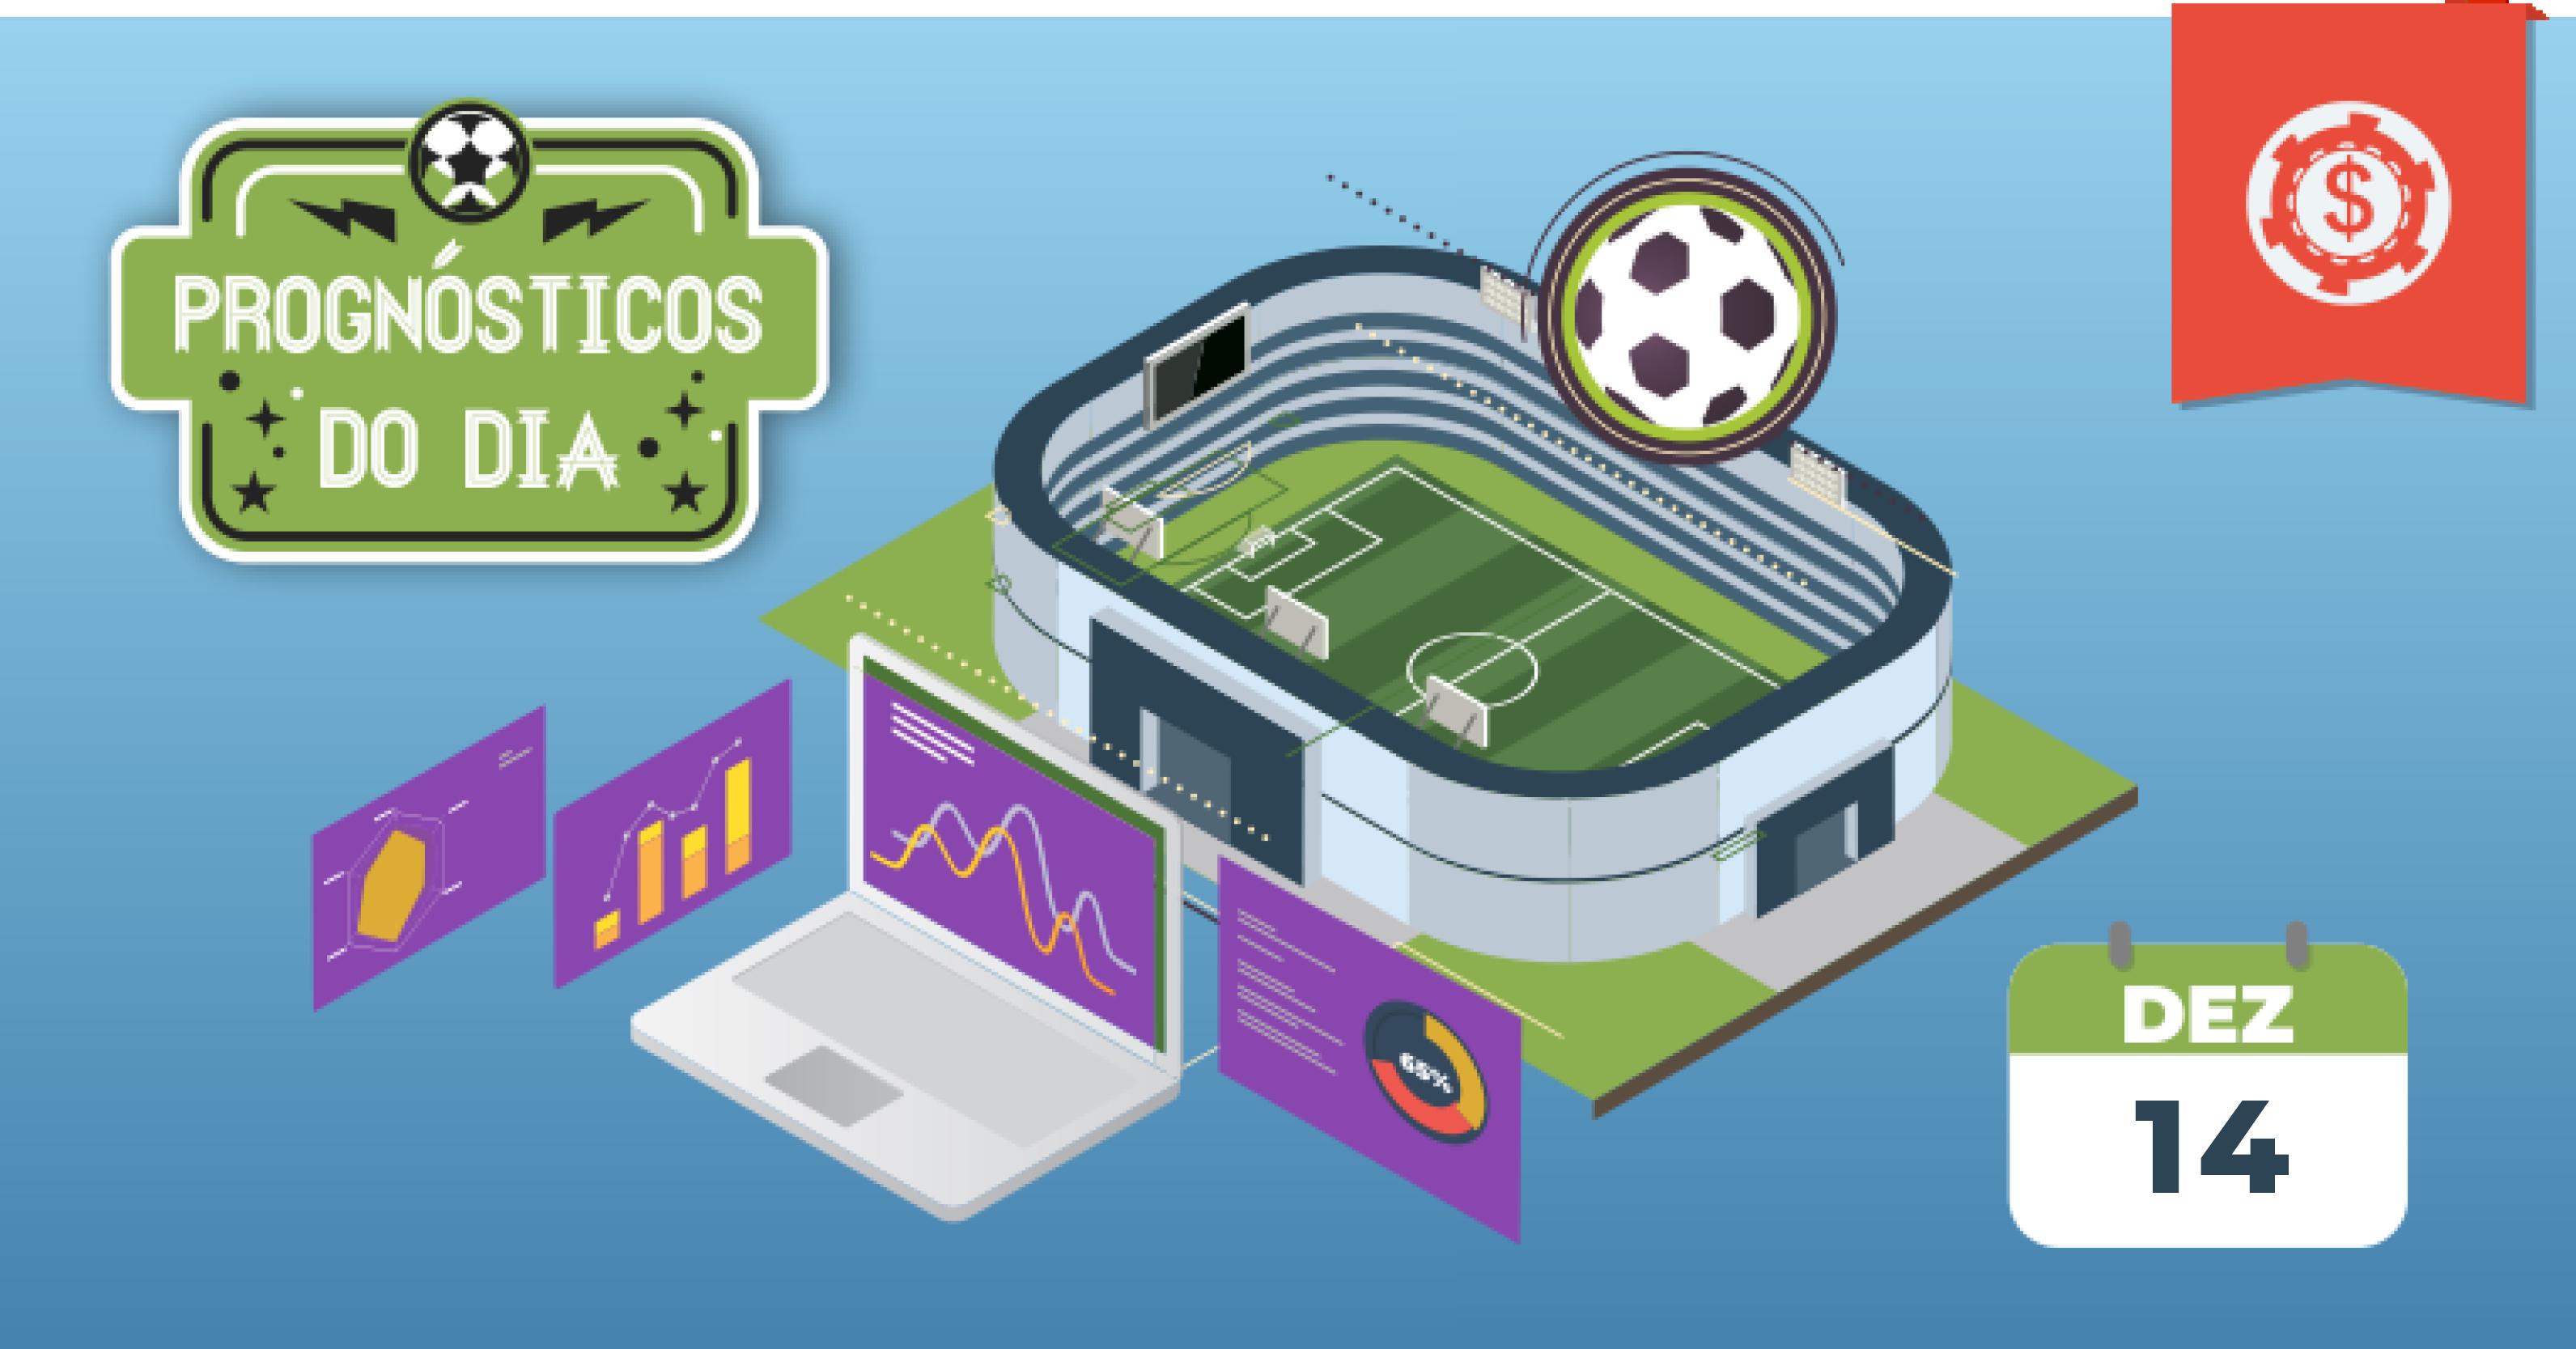 palpites-futebol-hoje-prognosticos-14-dezembro-2019